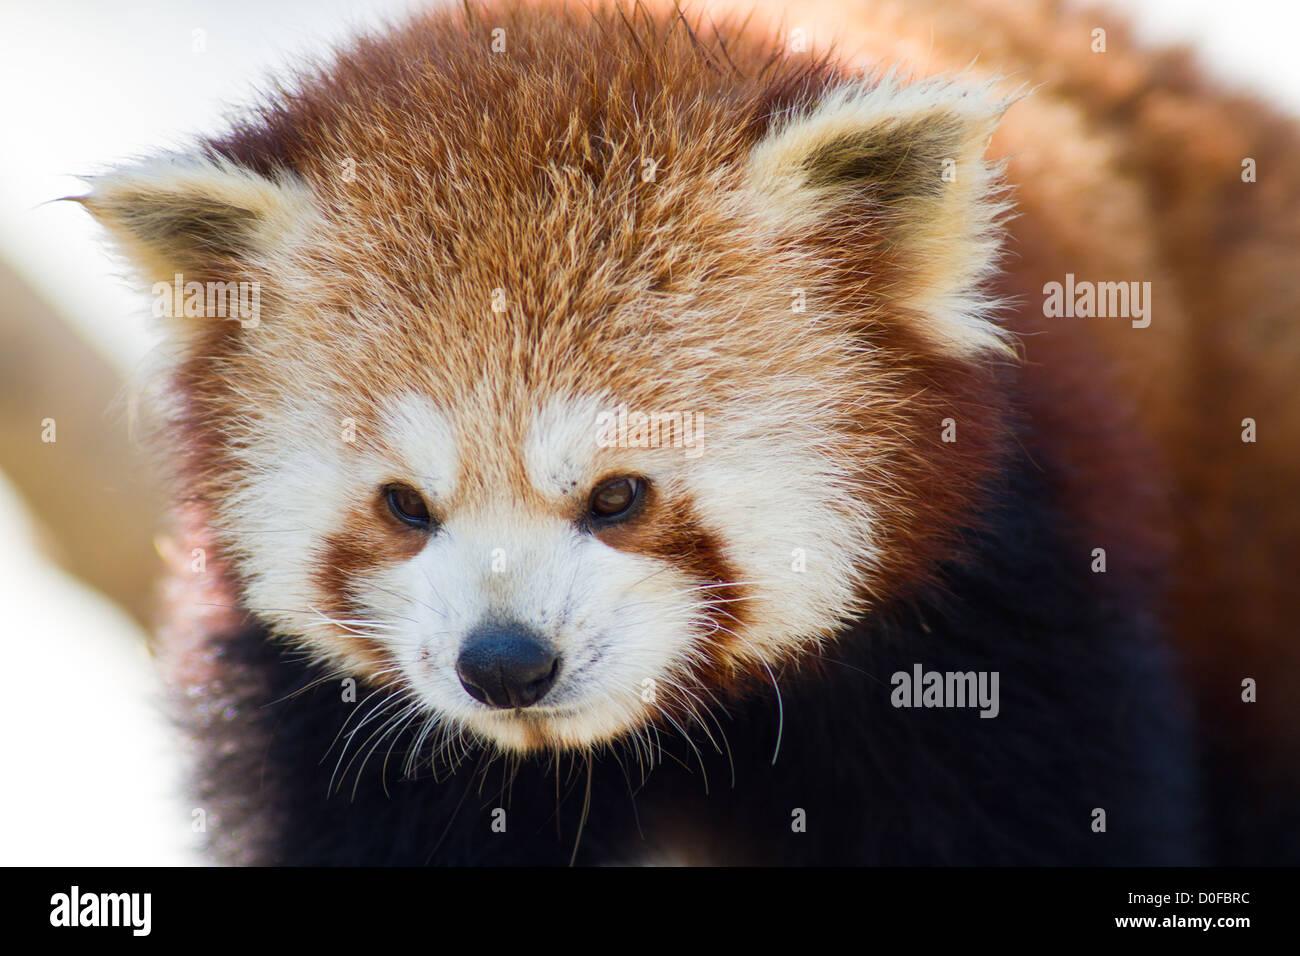 Close up of a Red Panda - Ailurus fulgens - Stock Image